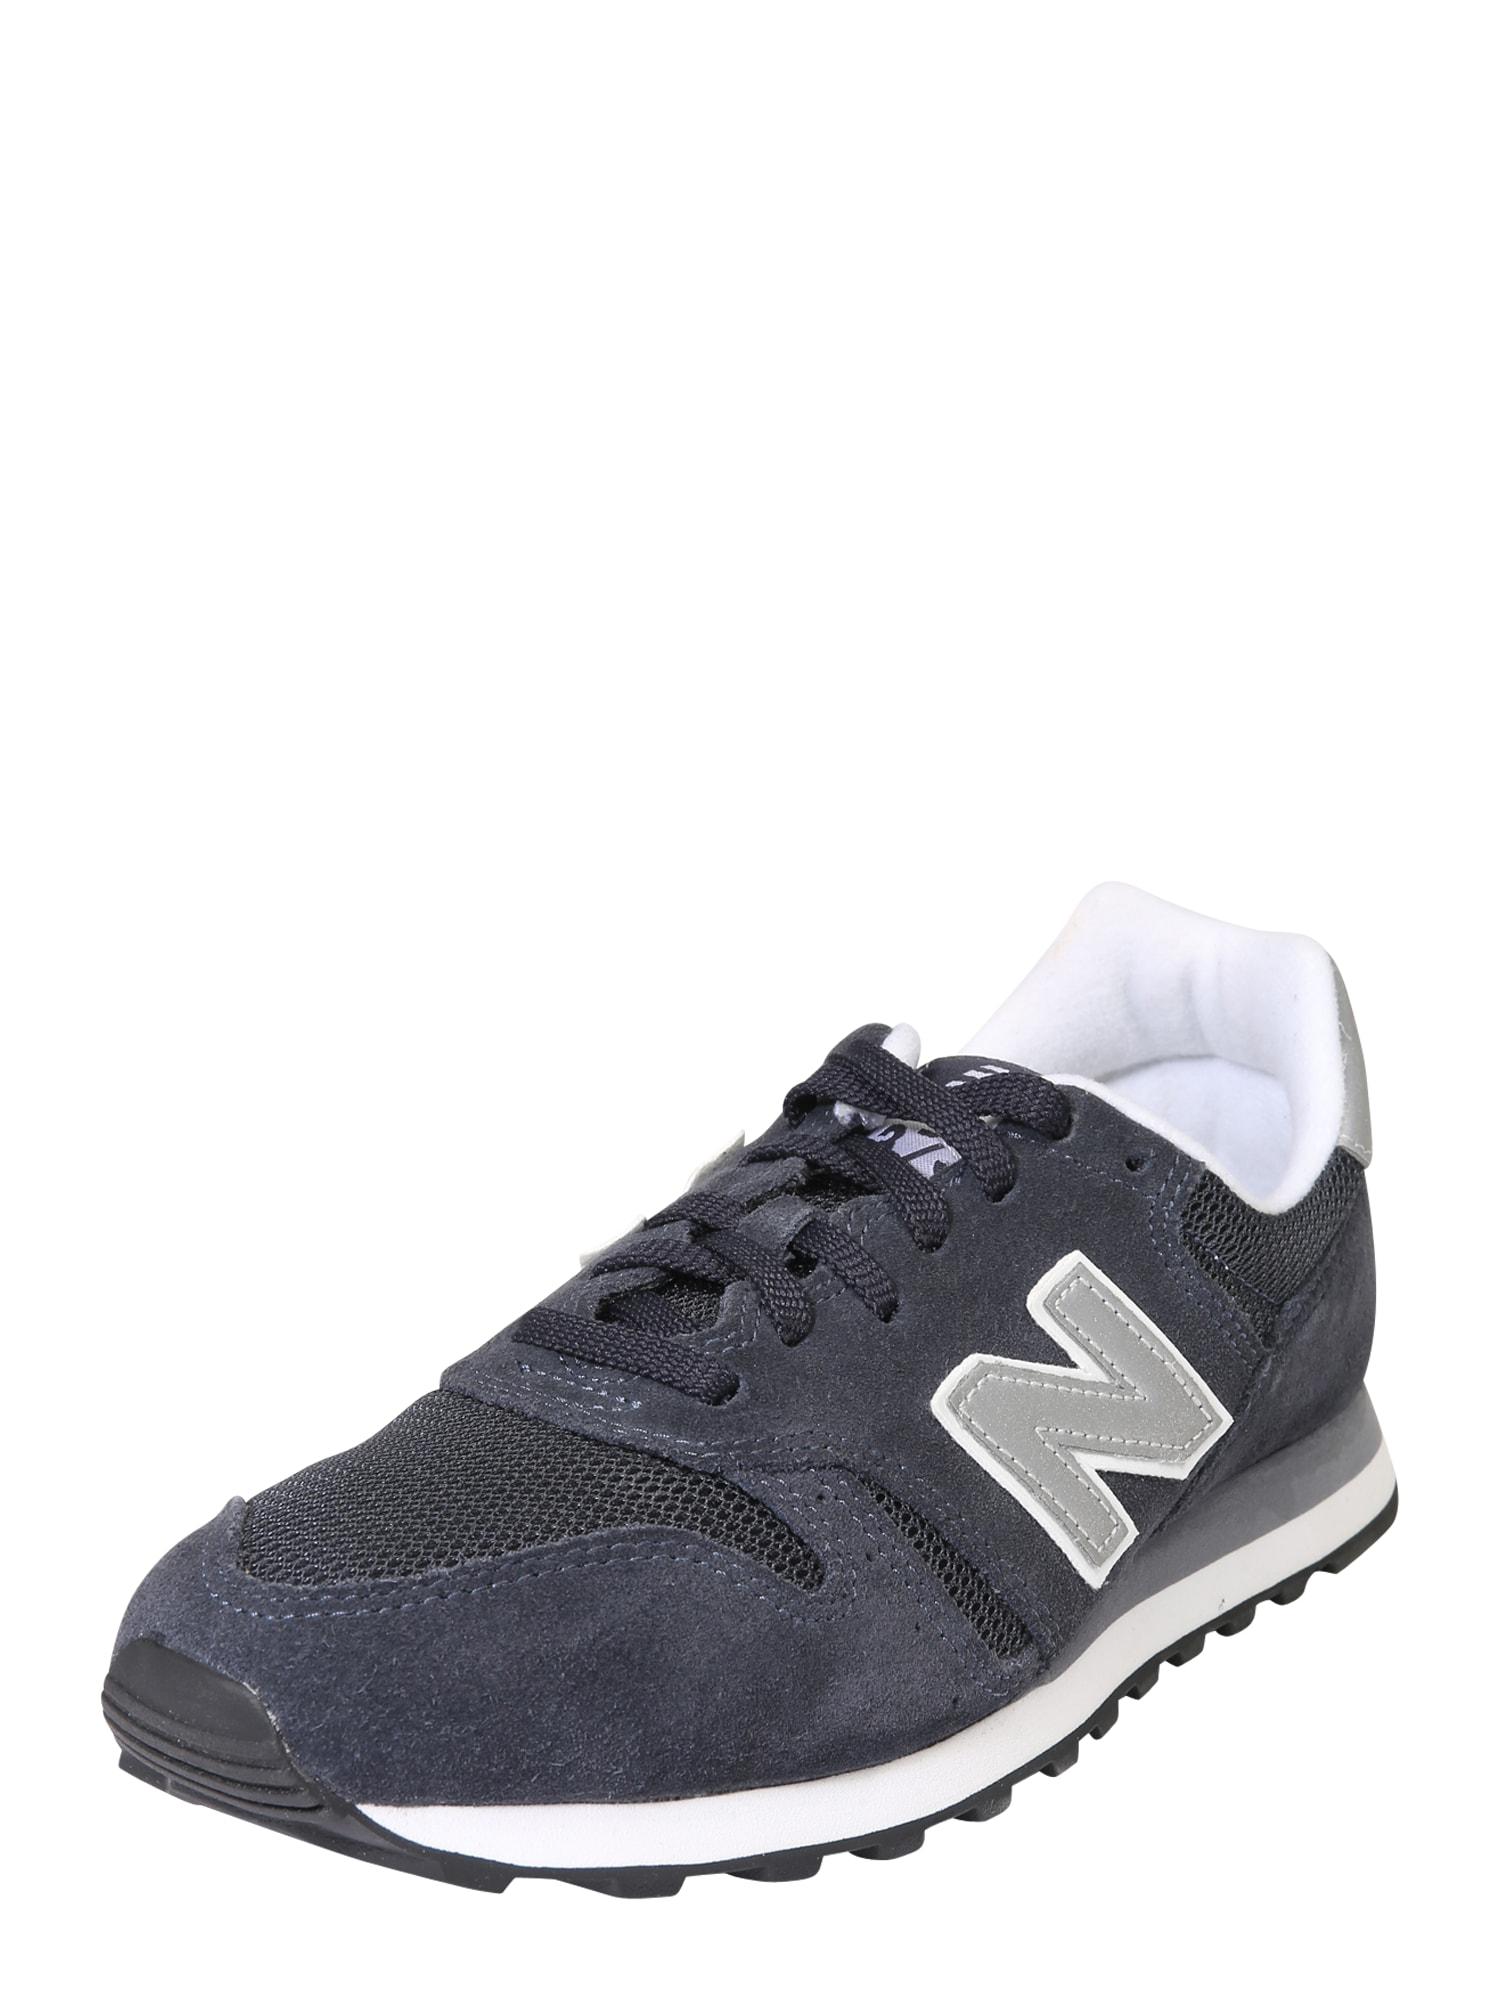 New Balance Tenisky 'ML373'  marine modrá / stříbrně šedá